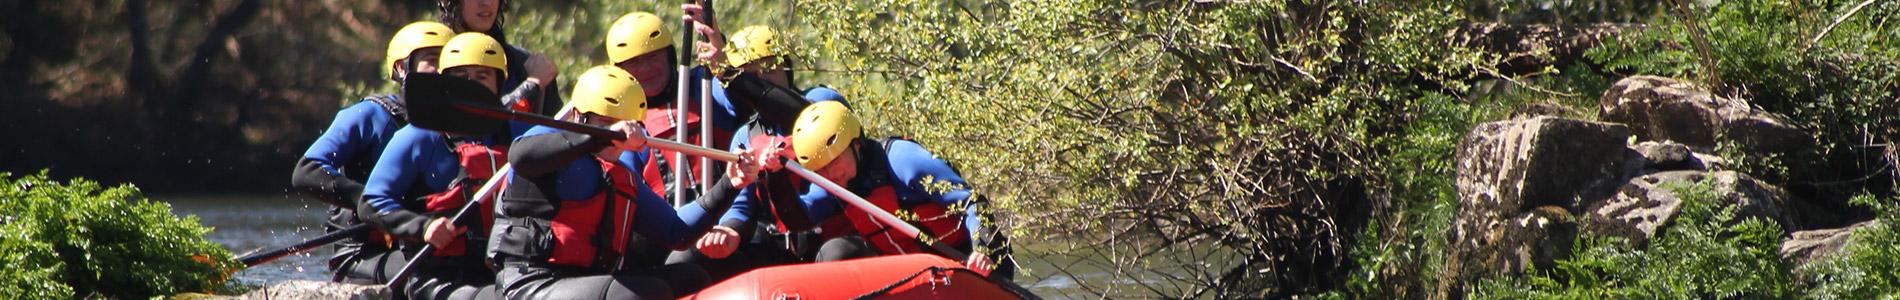 Führungskräfteentwicklung, Rafting, Fluss, Wildwasser, Teamführung, Teamtraining